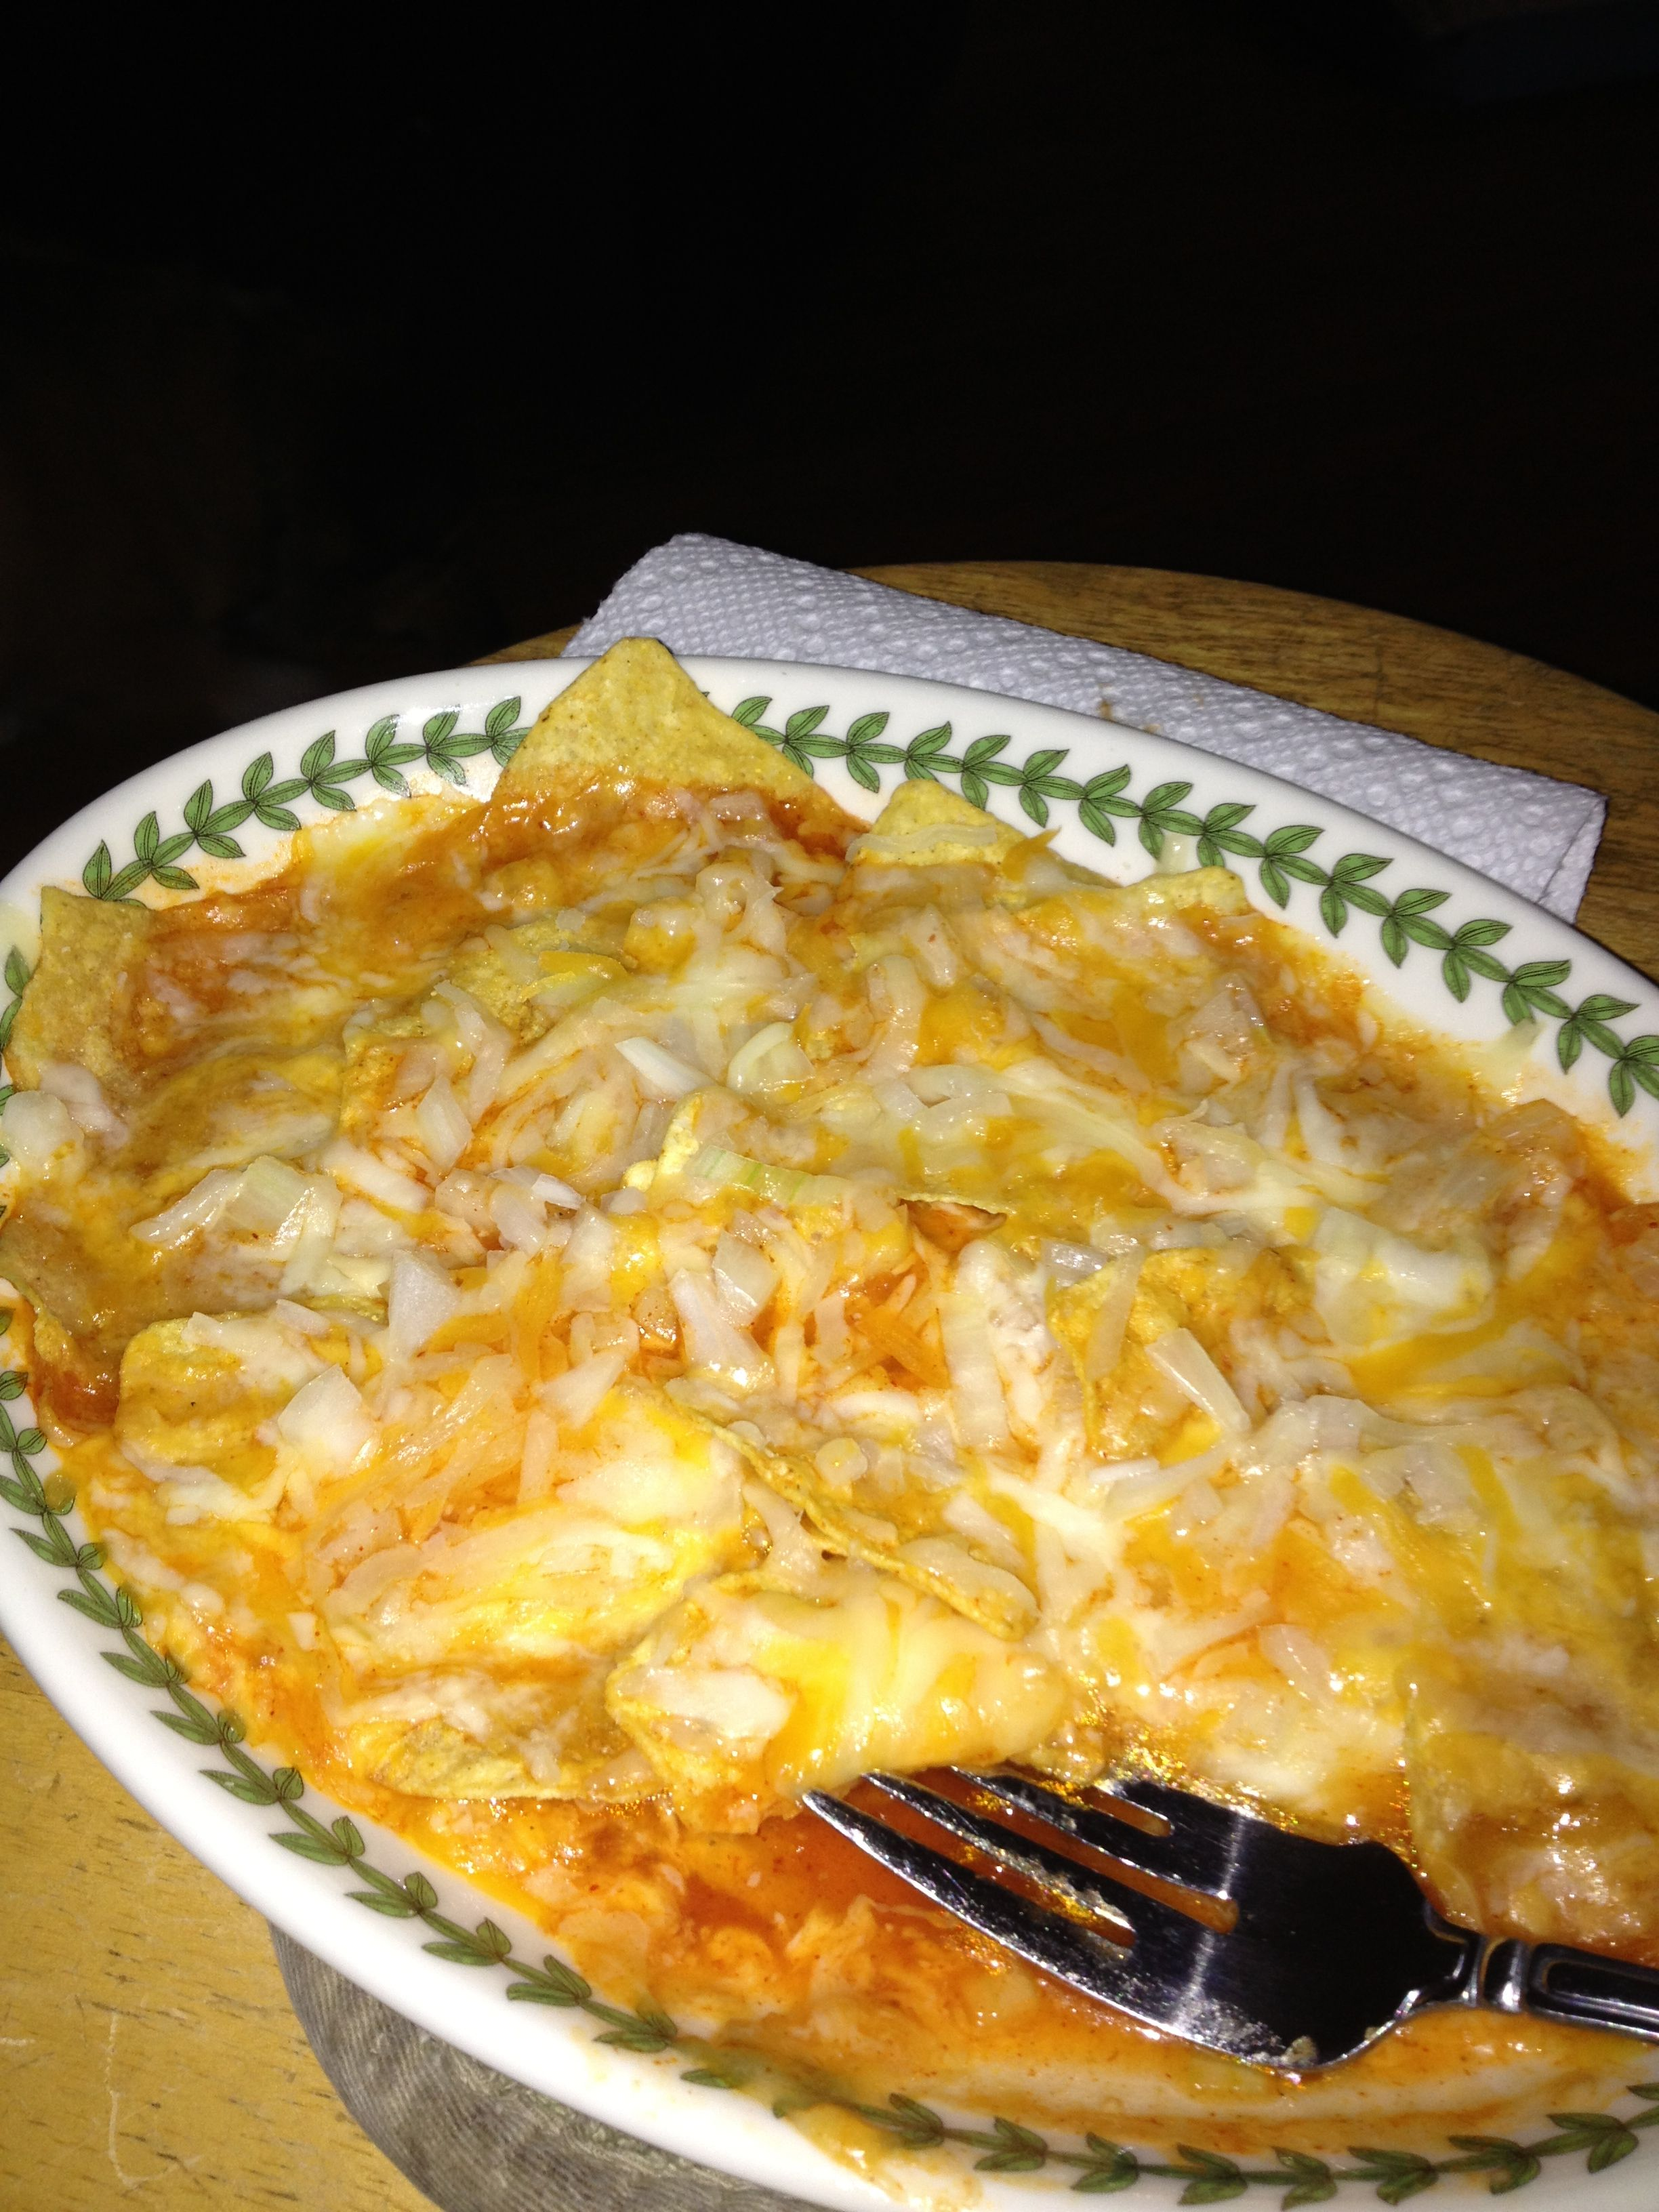 Dorm room enchiladas tortilla chips enchilada